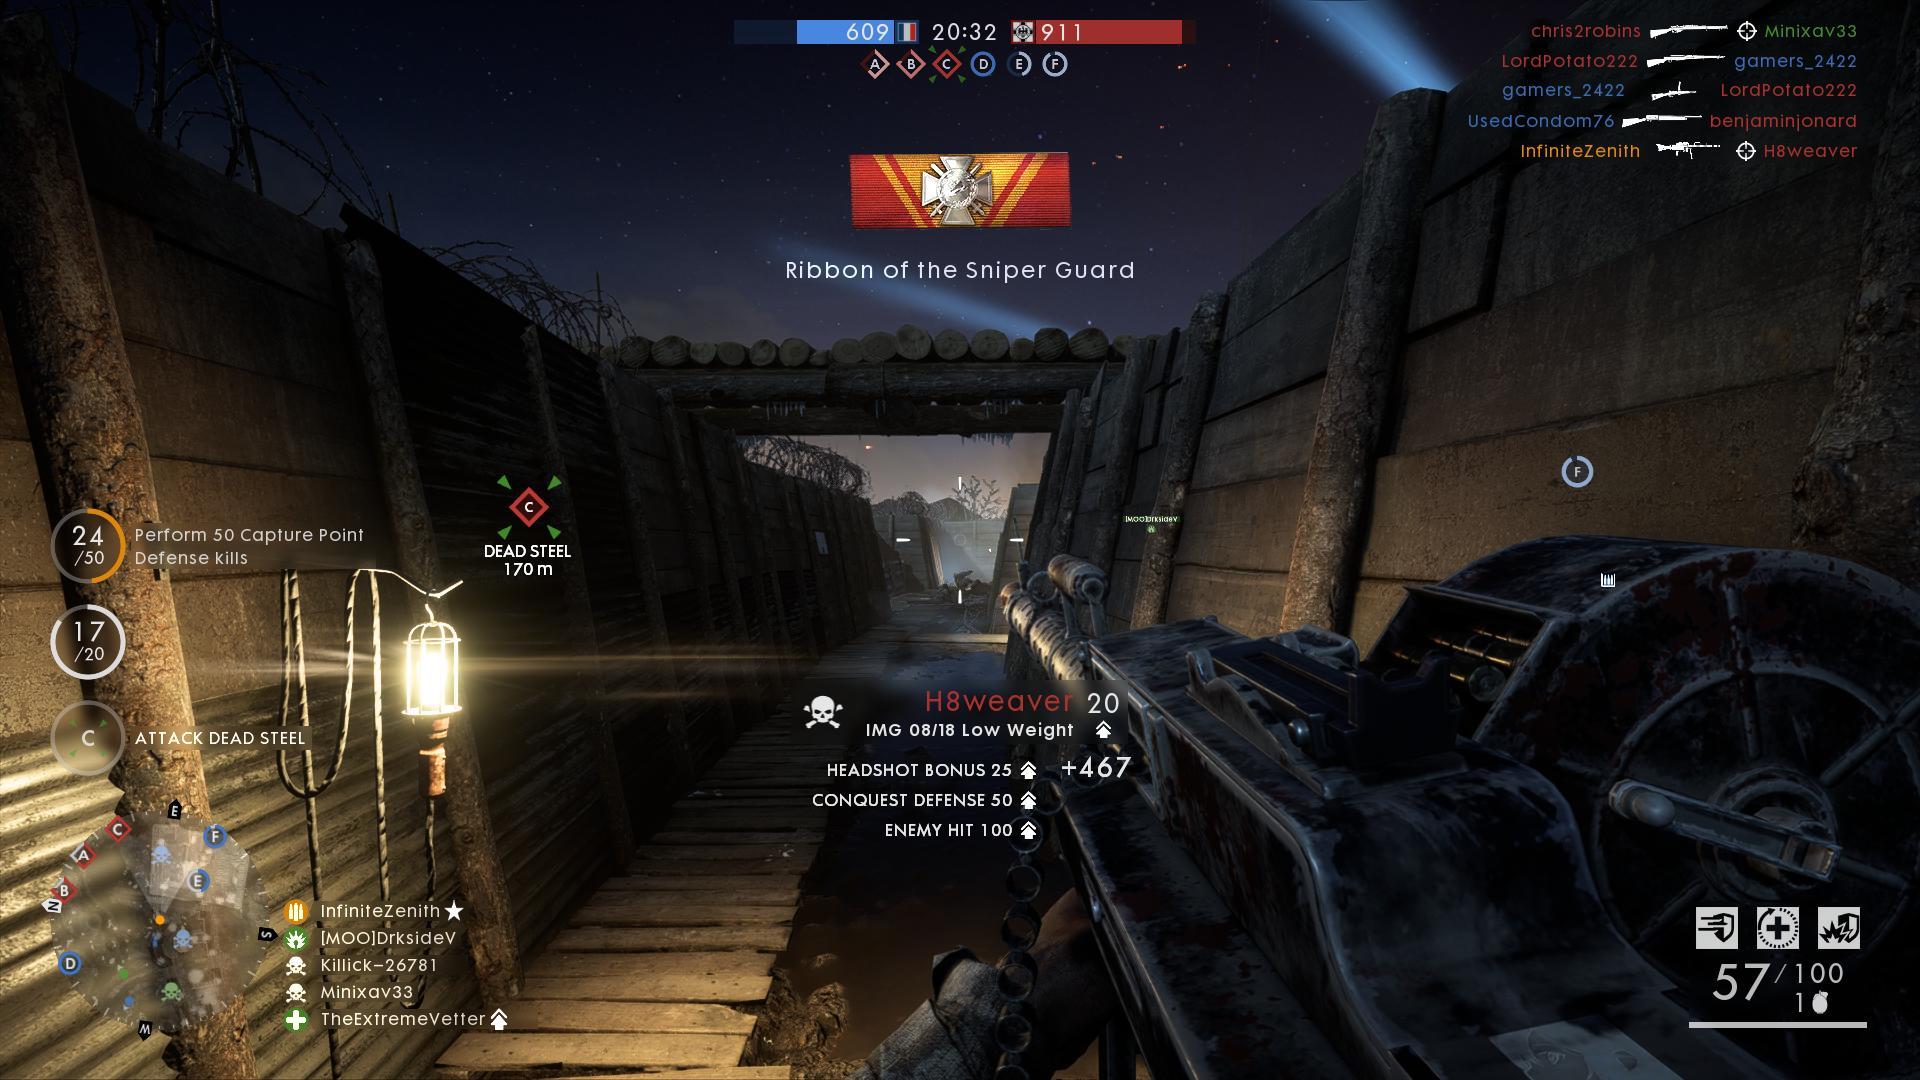 Battlefield 1: Killtrocities, the Burton LMR and The Road To